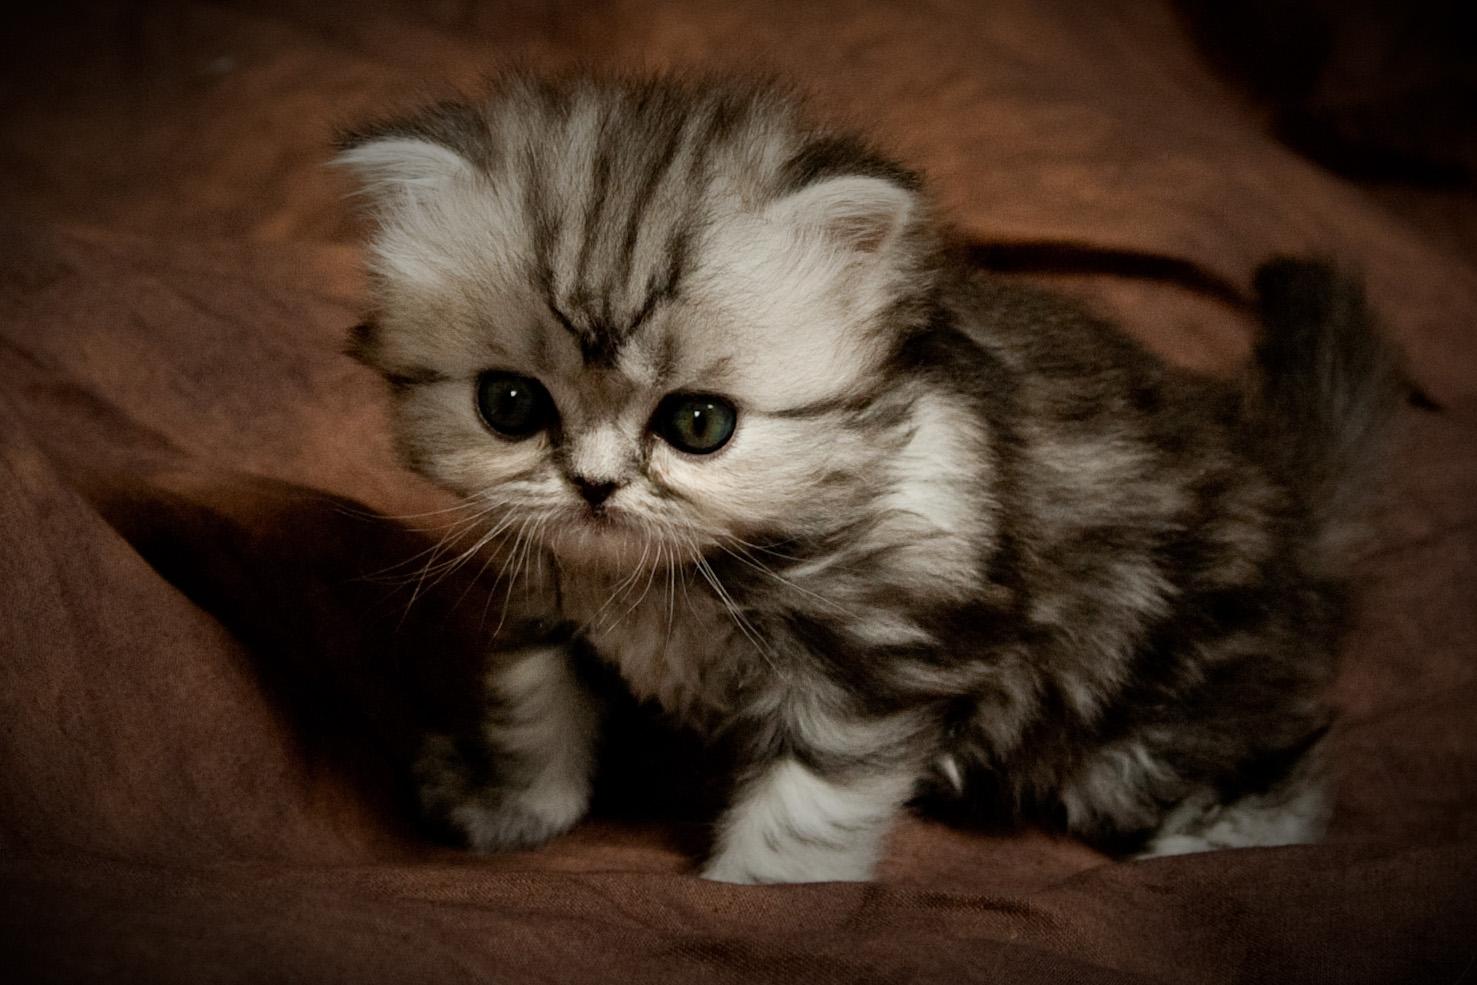 new cat cries at night